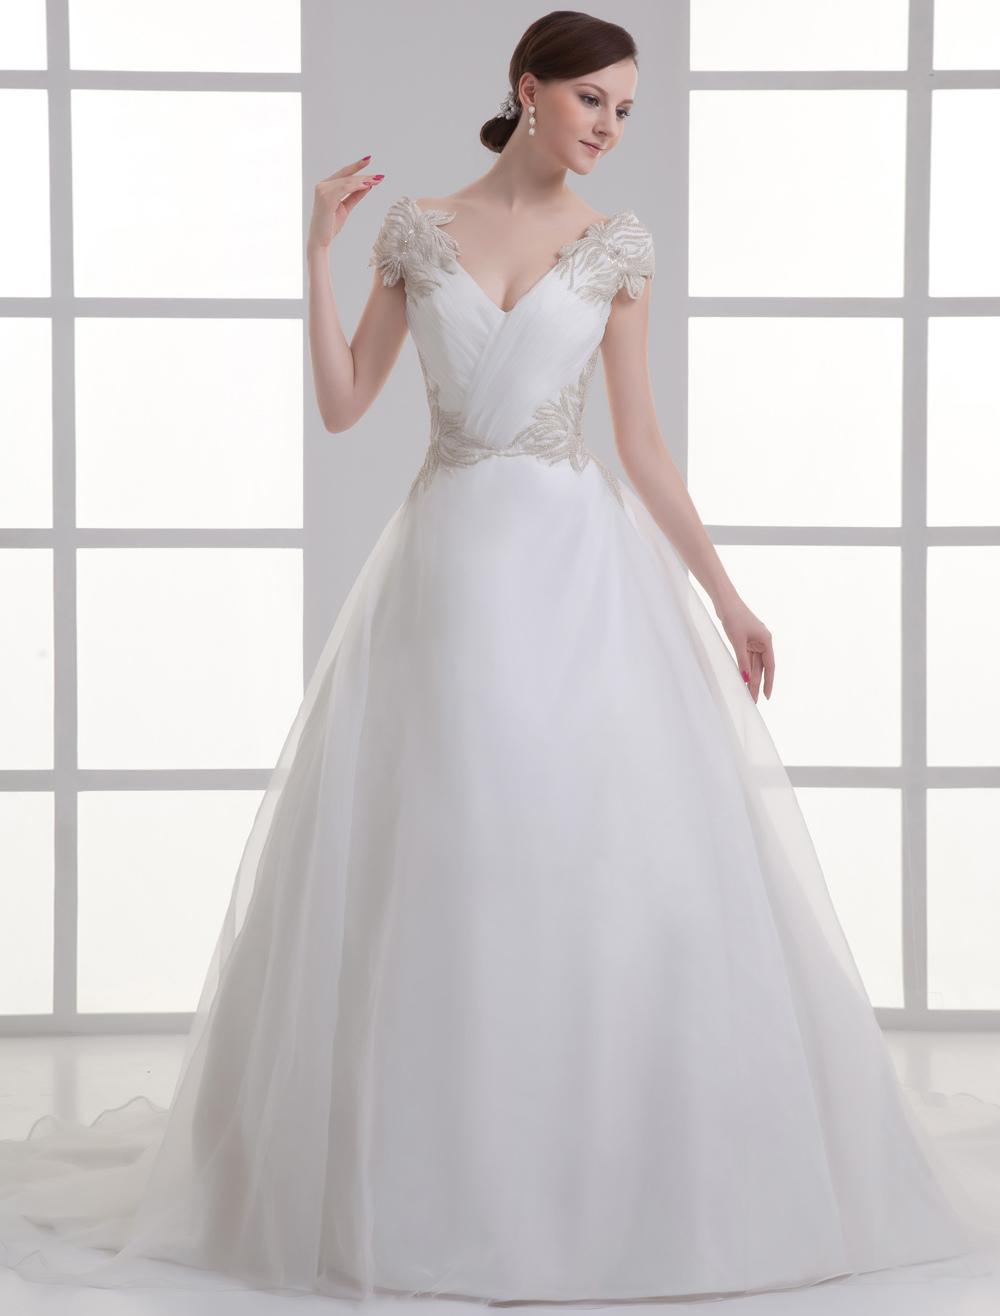 Ivory V-Neck Off-The-Shoulder Beading Organza Wedding Gown